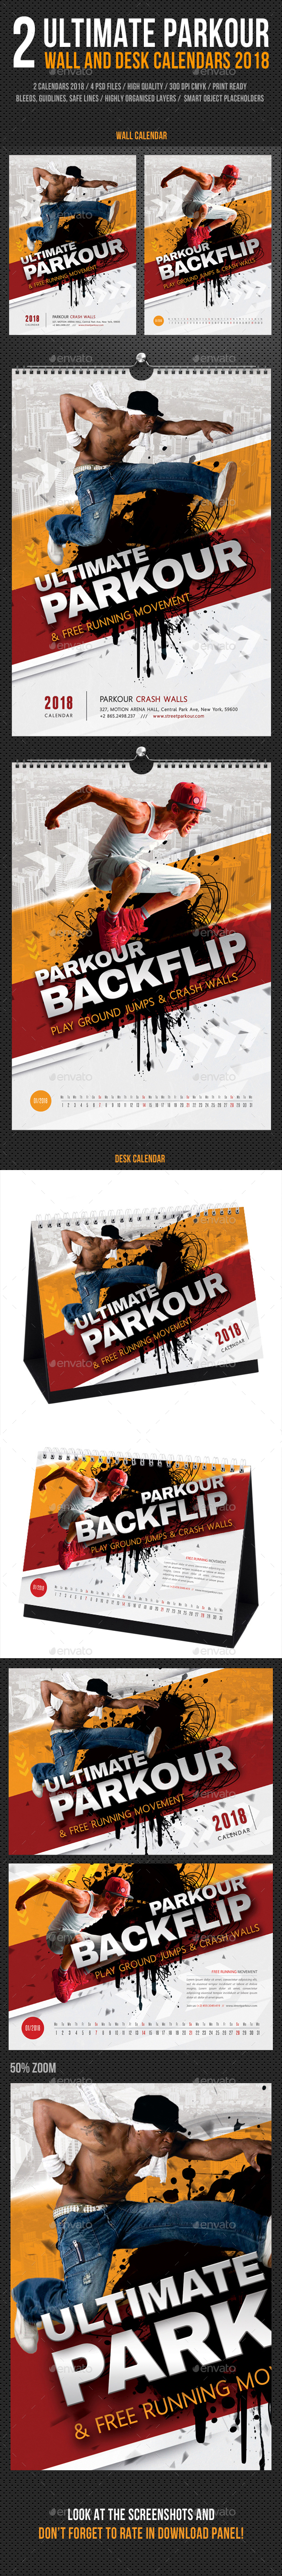 Ultimate Parkour Wall - Desk Calendar 2018 Bundle - Calendars Stationery